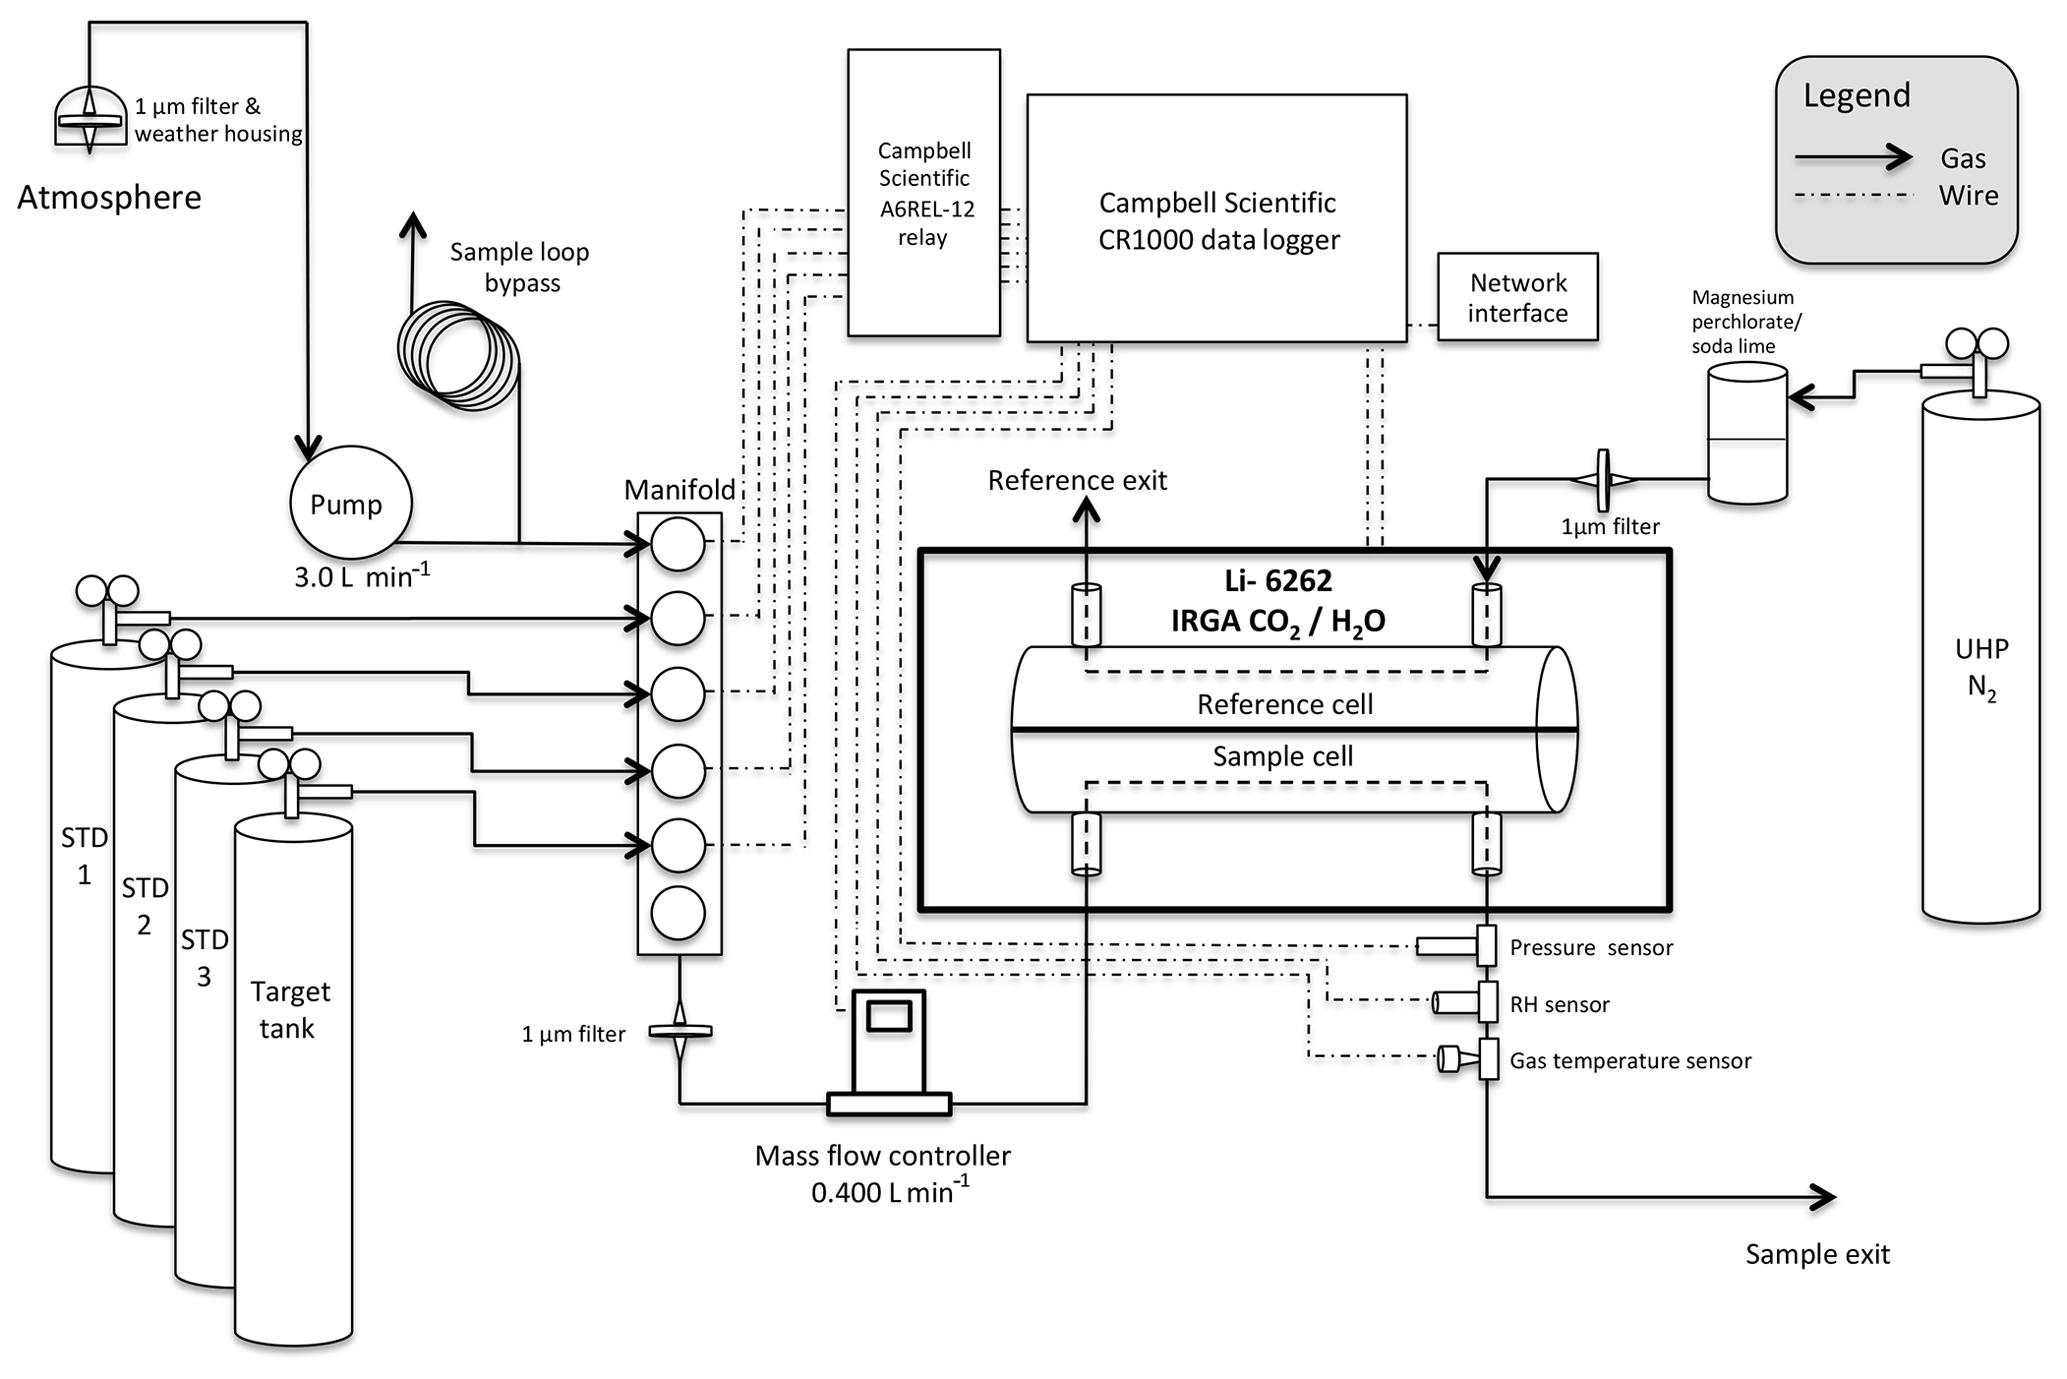 spaguts wiring diagram pool wiring schematic wiring diagrams site  pool wiring schematic wiring diagrams